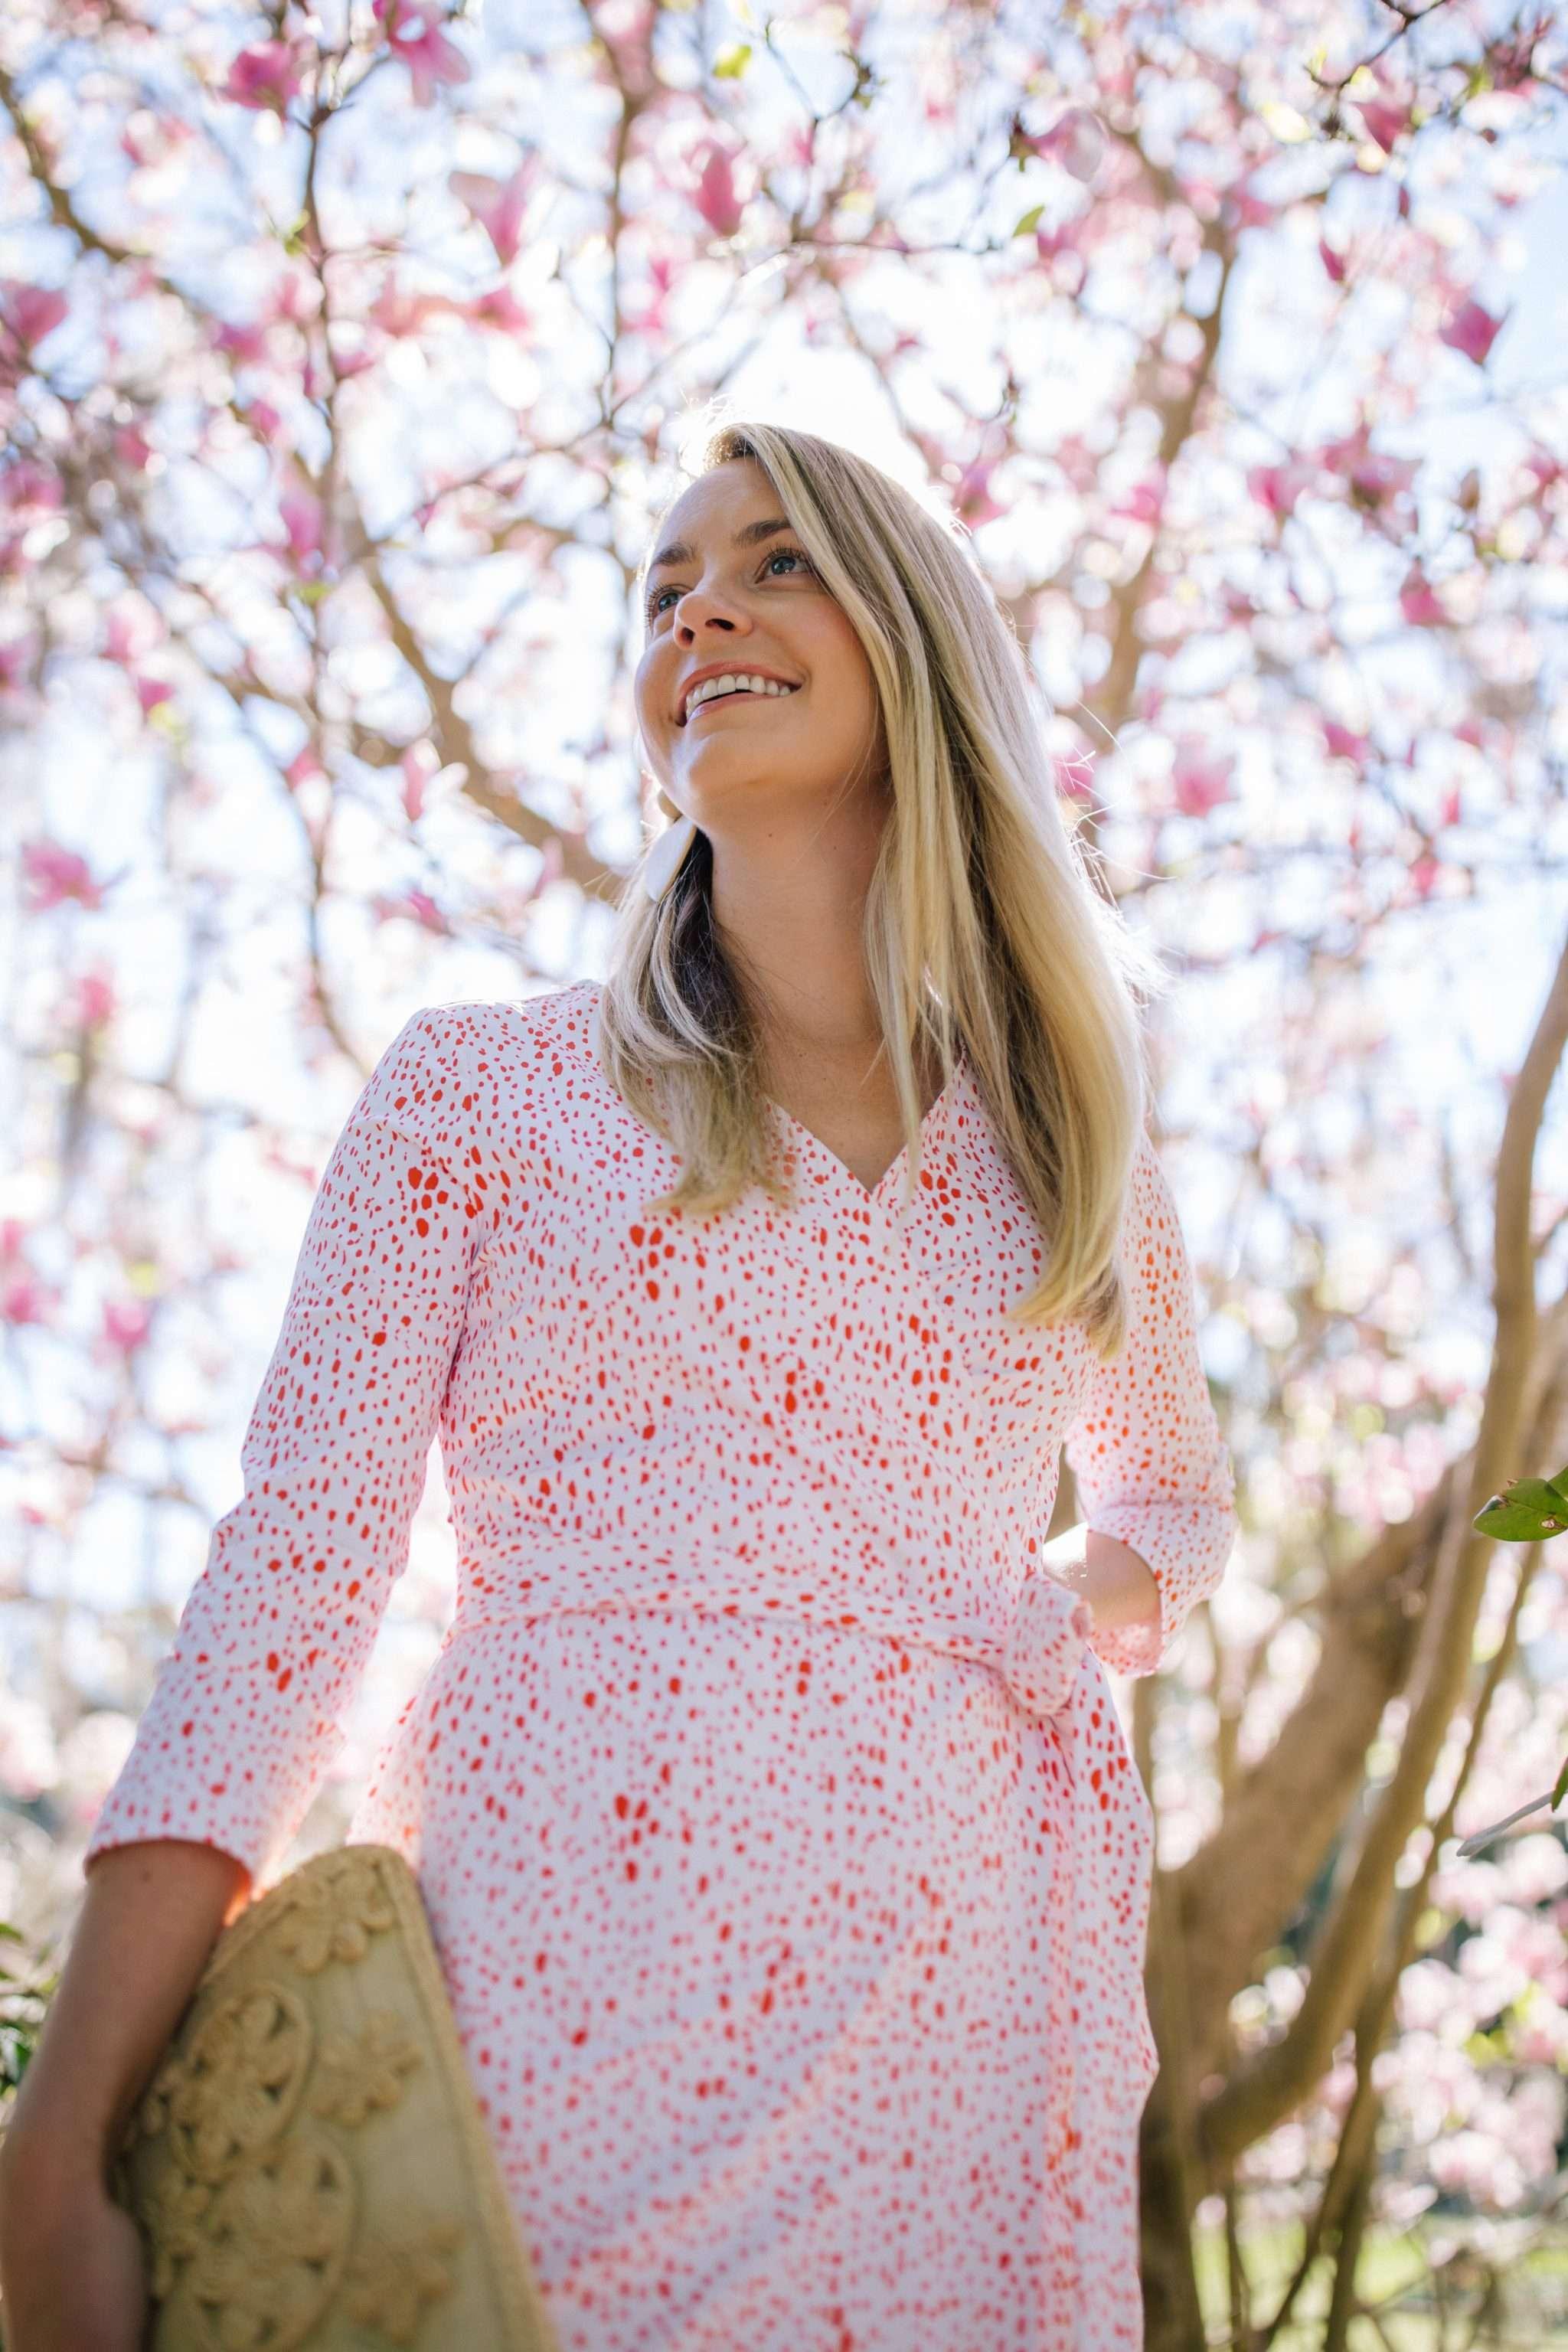 Wardrobe 101: How to Wear a Wrap Dress | Rhyme & Reason